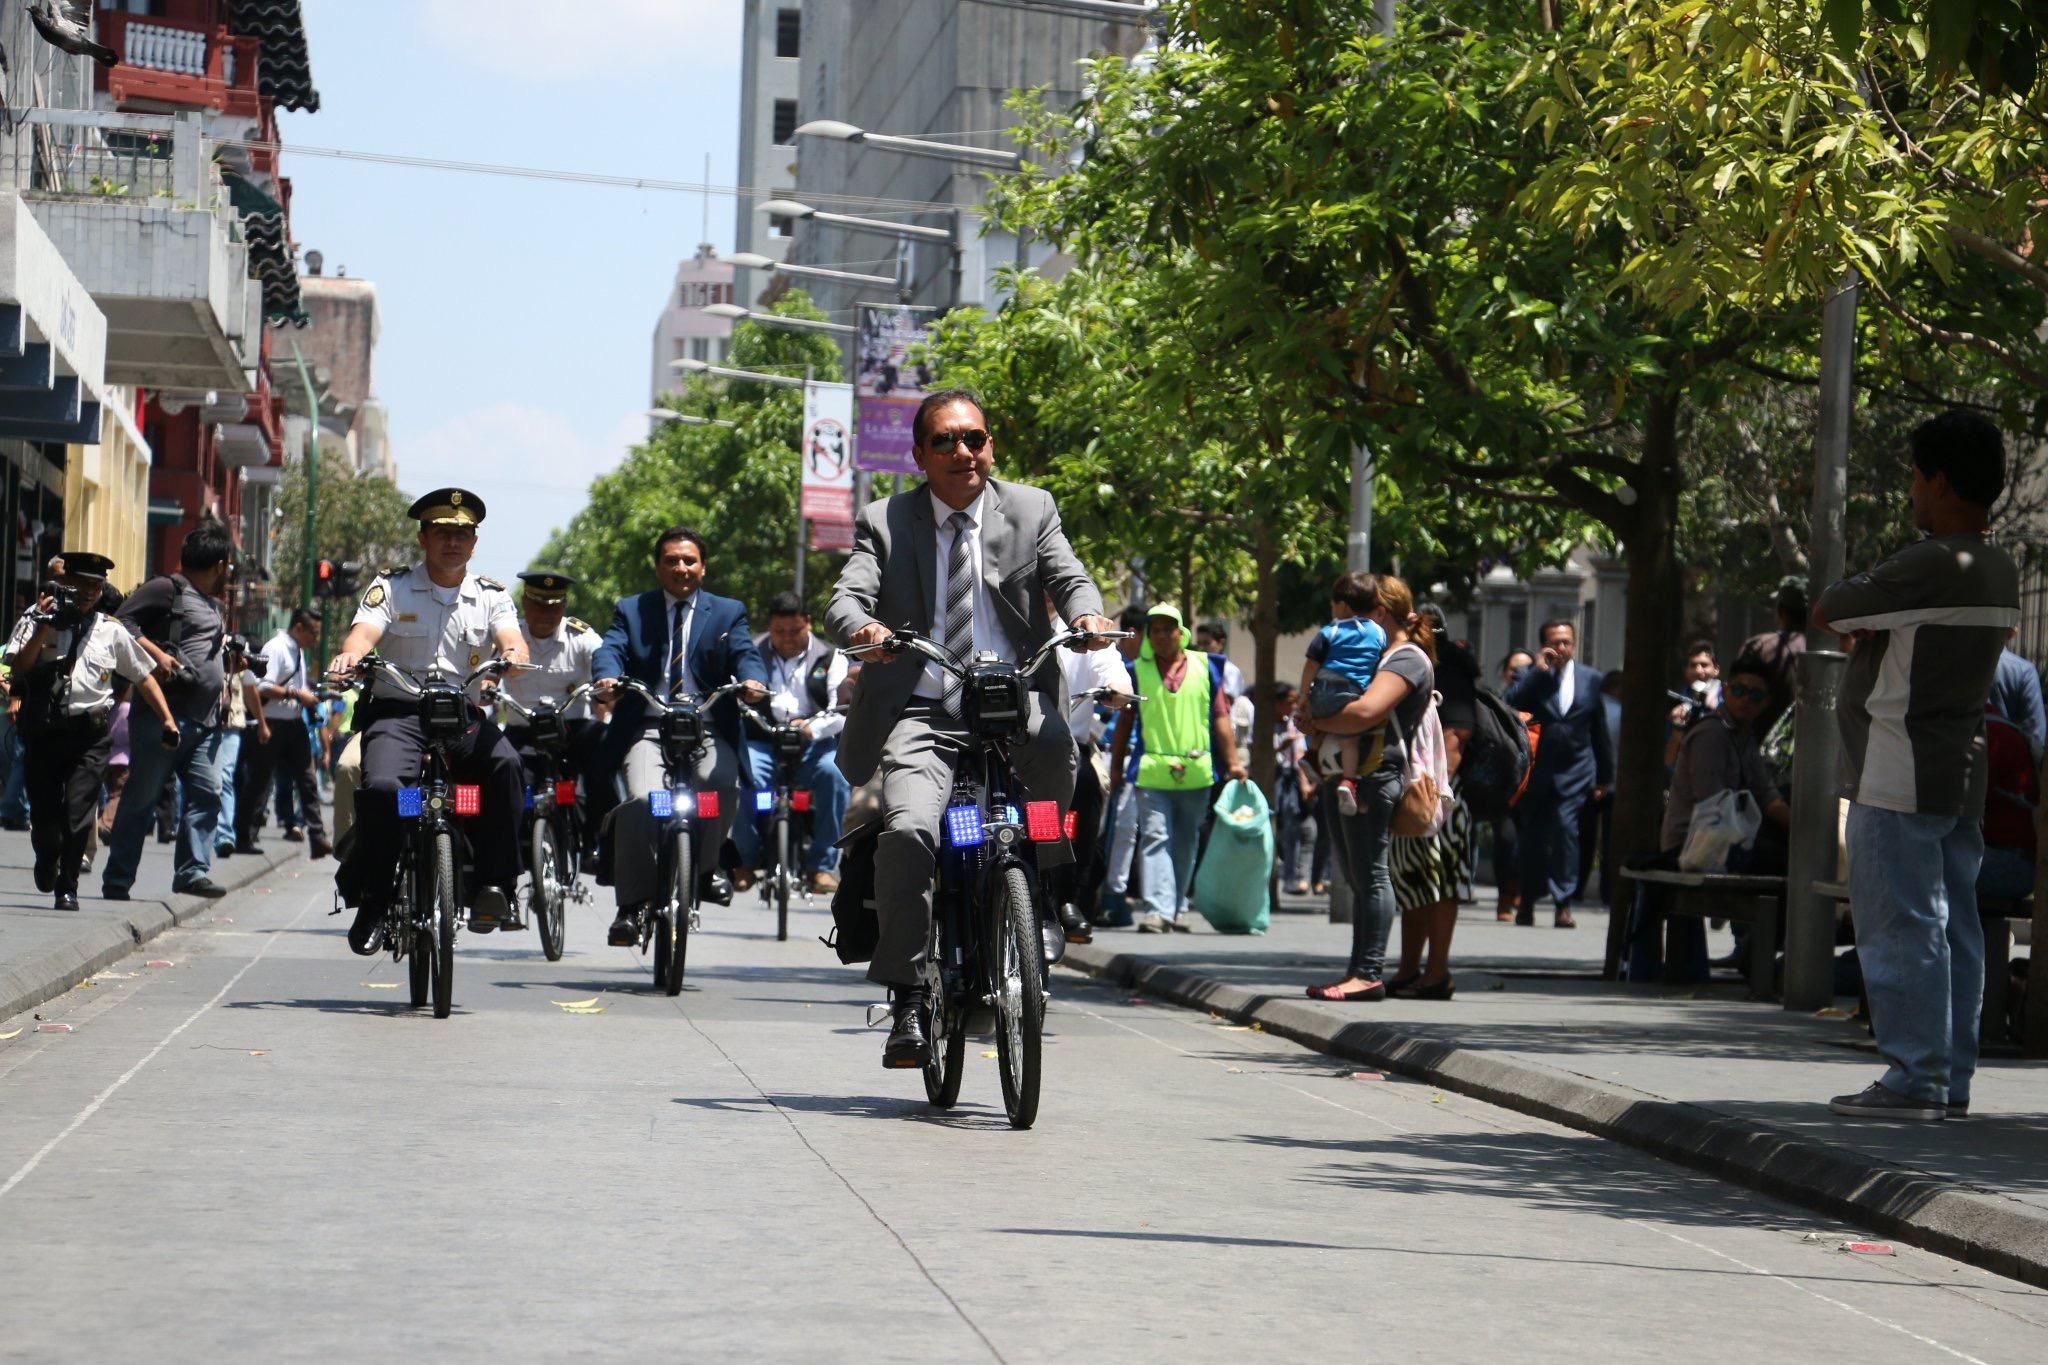 Ministerio de gobernaci n recibe donaci n de bicicletas for Ministerio de gobernacion